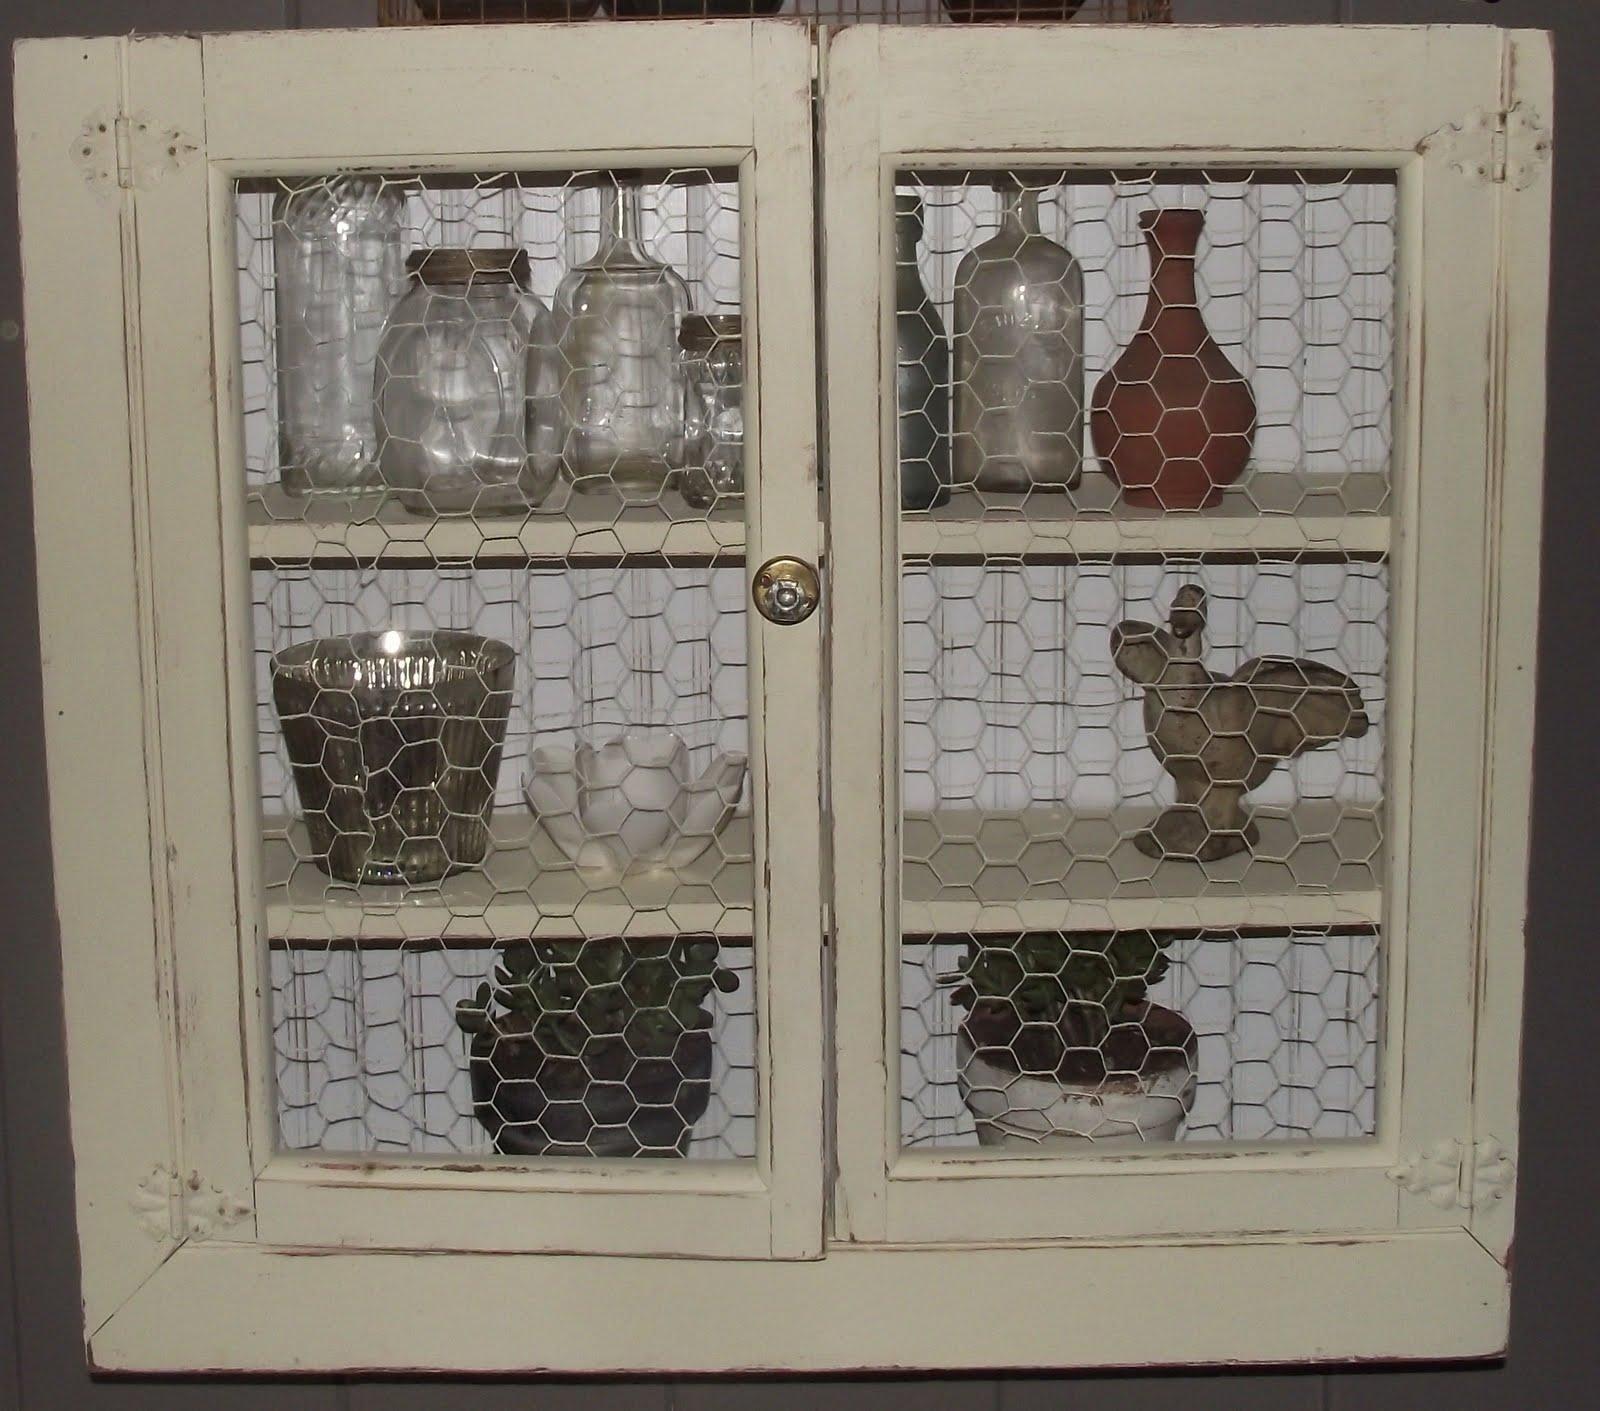 Serendipity Chic Design: Vintage cabinet with chicken wire